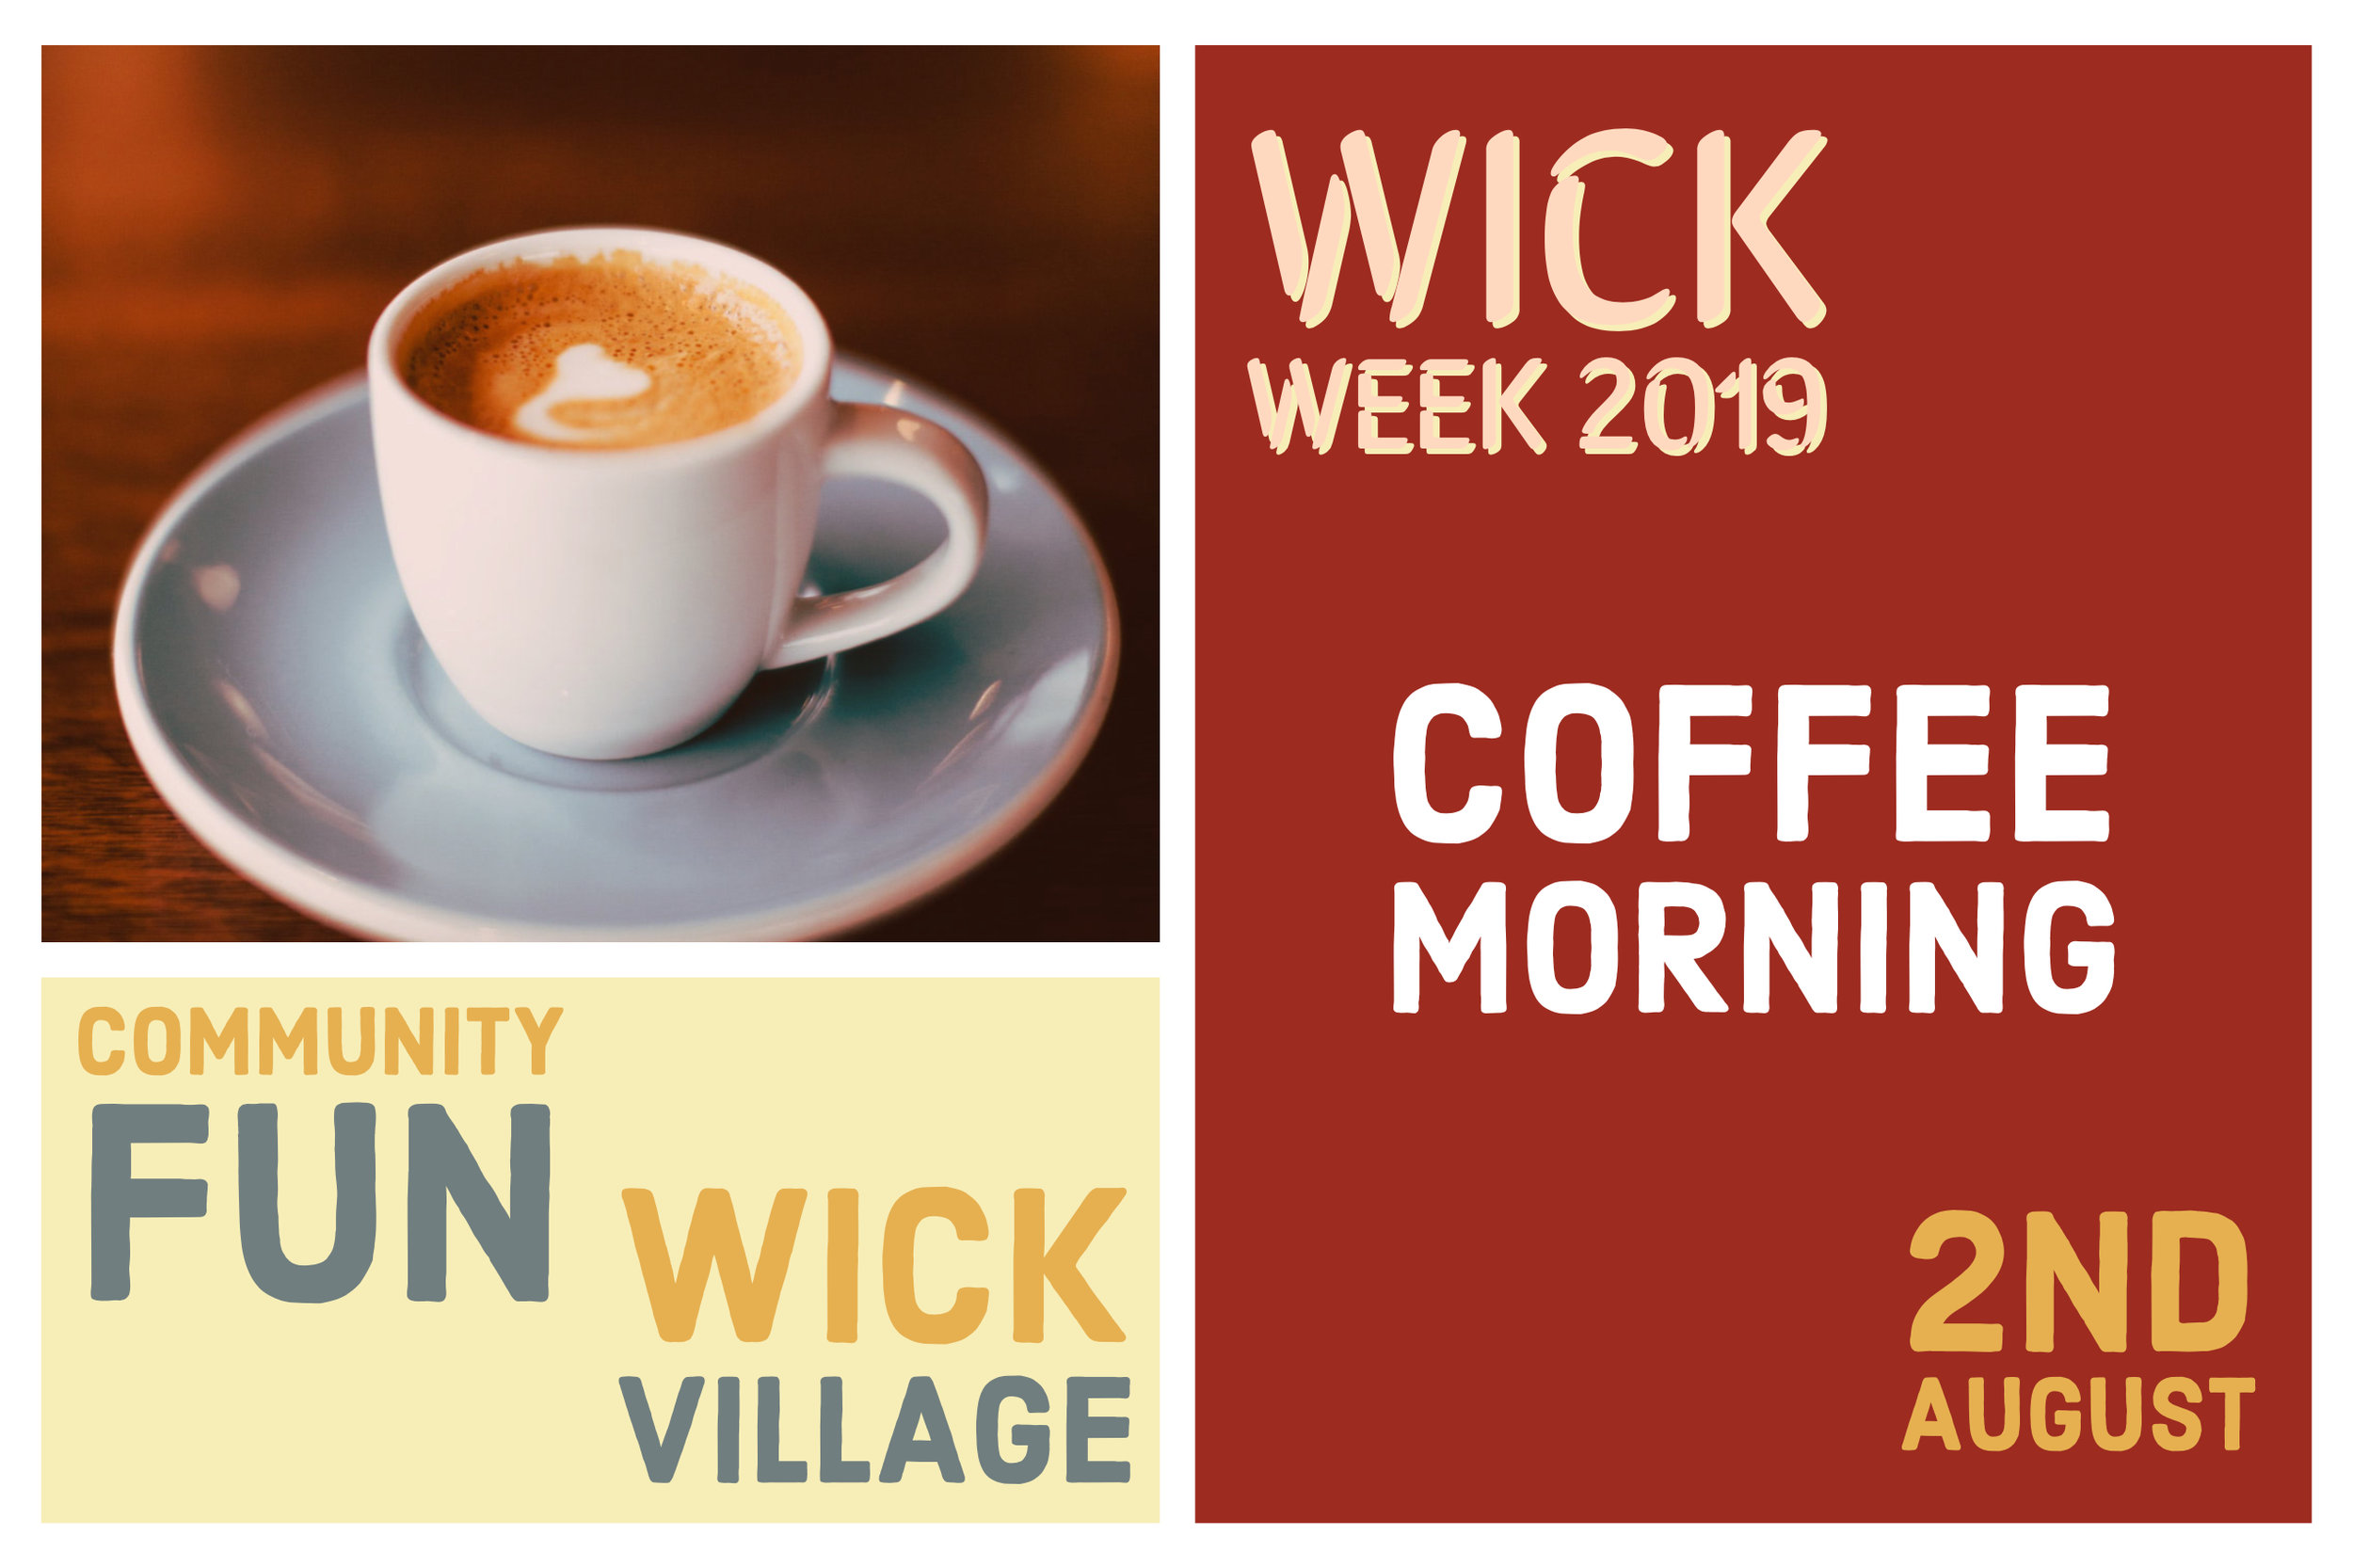 Wick Week 2019 - Coffee Morning.